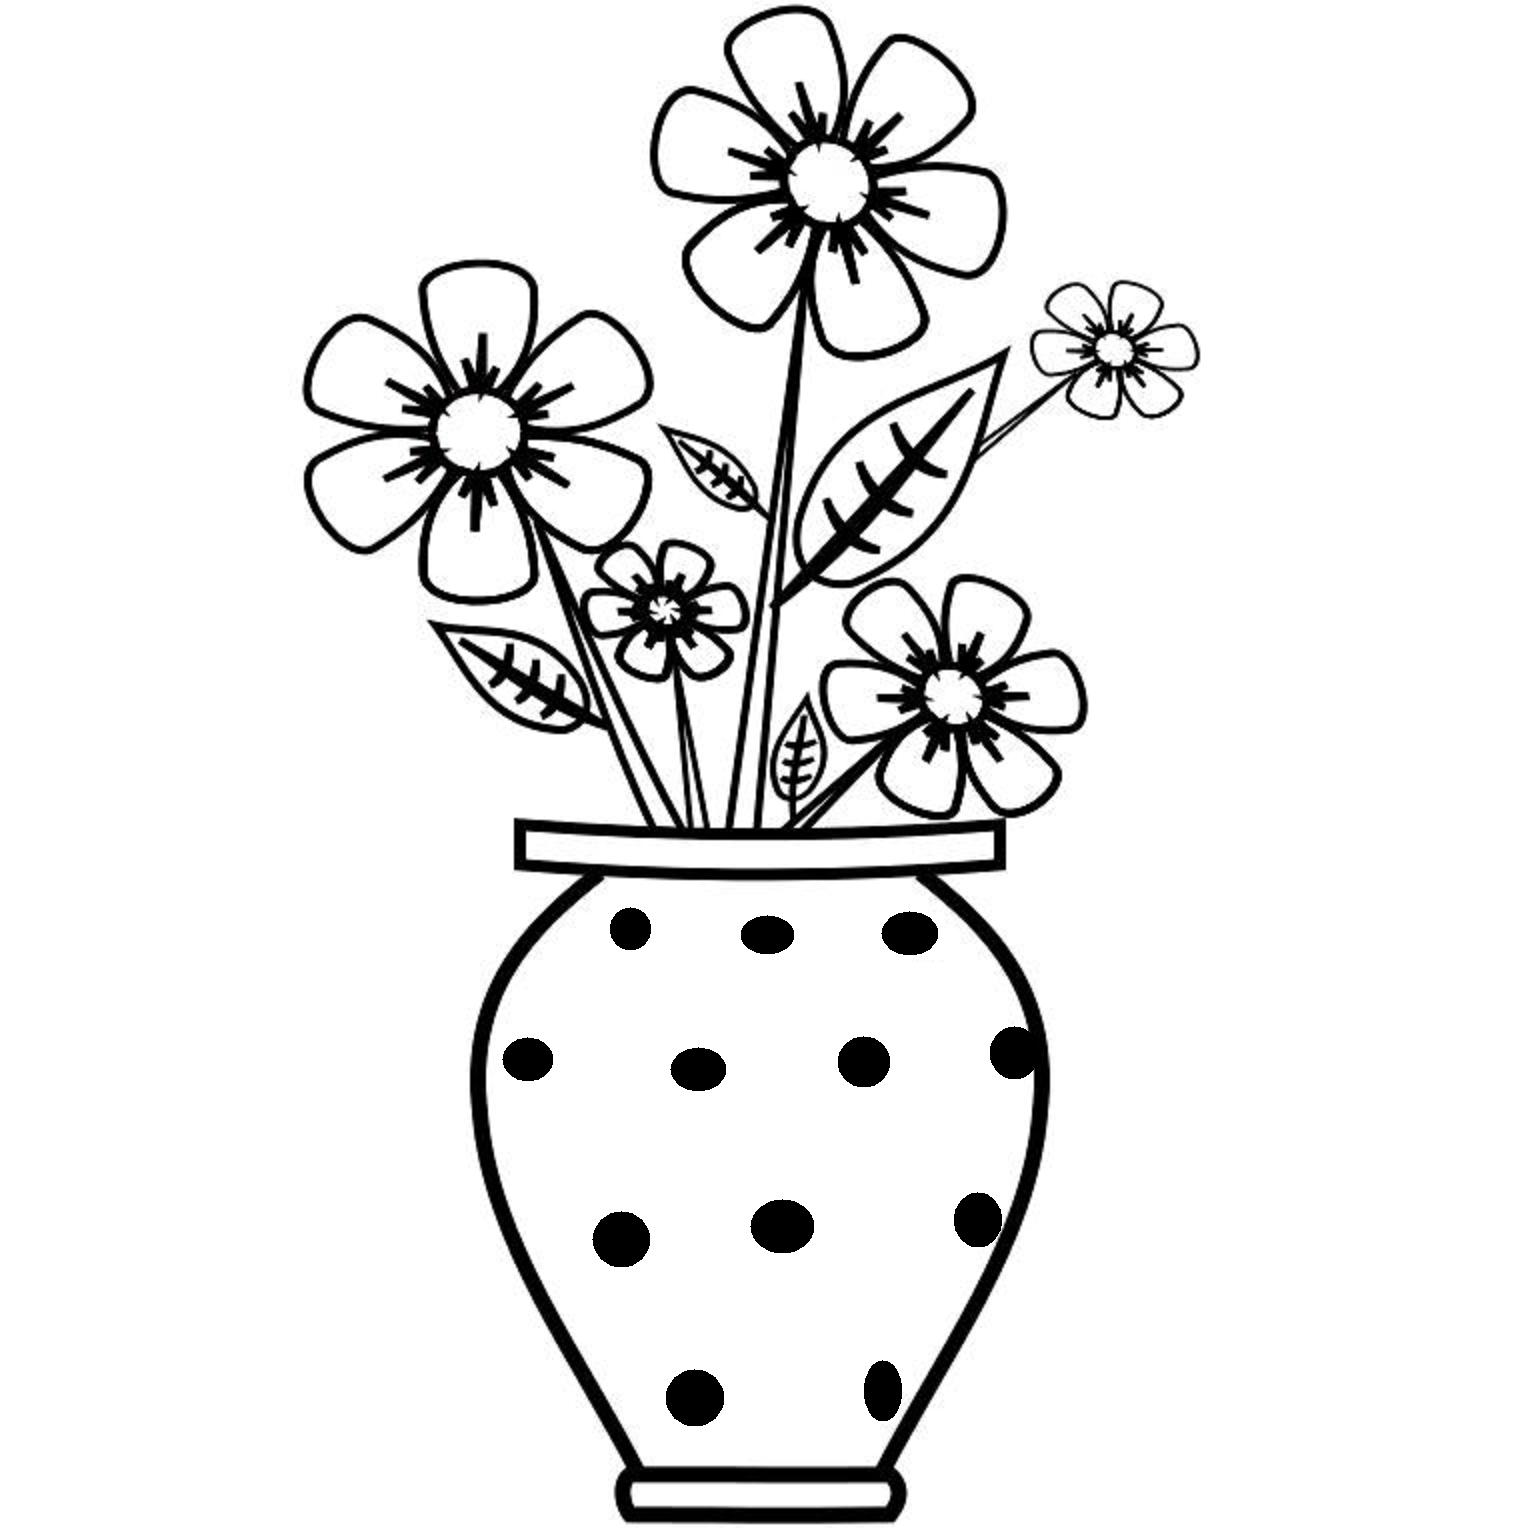 Flower vase drawing at getdrawings free for personal use 1532x1528 drawing of a flower vase drawing pictures of flower vase izmirmasajfo Choice Image